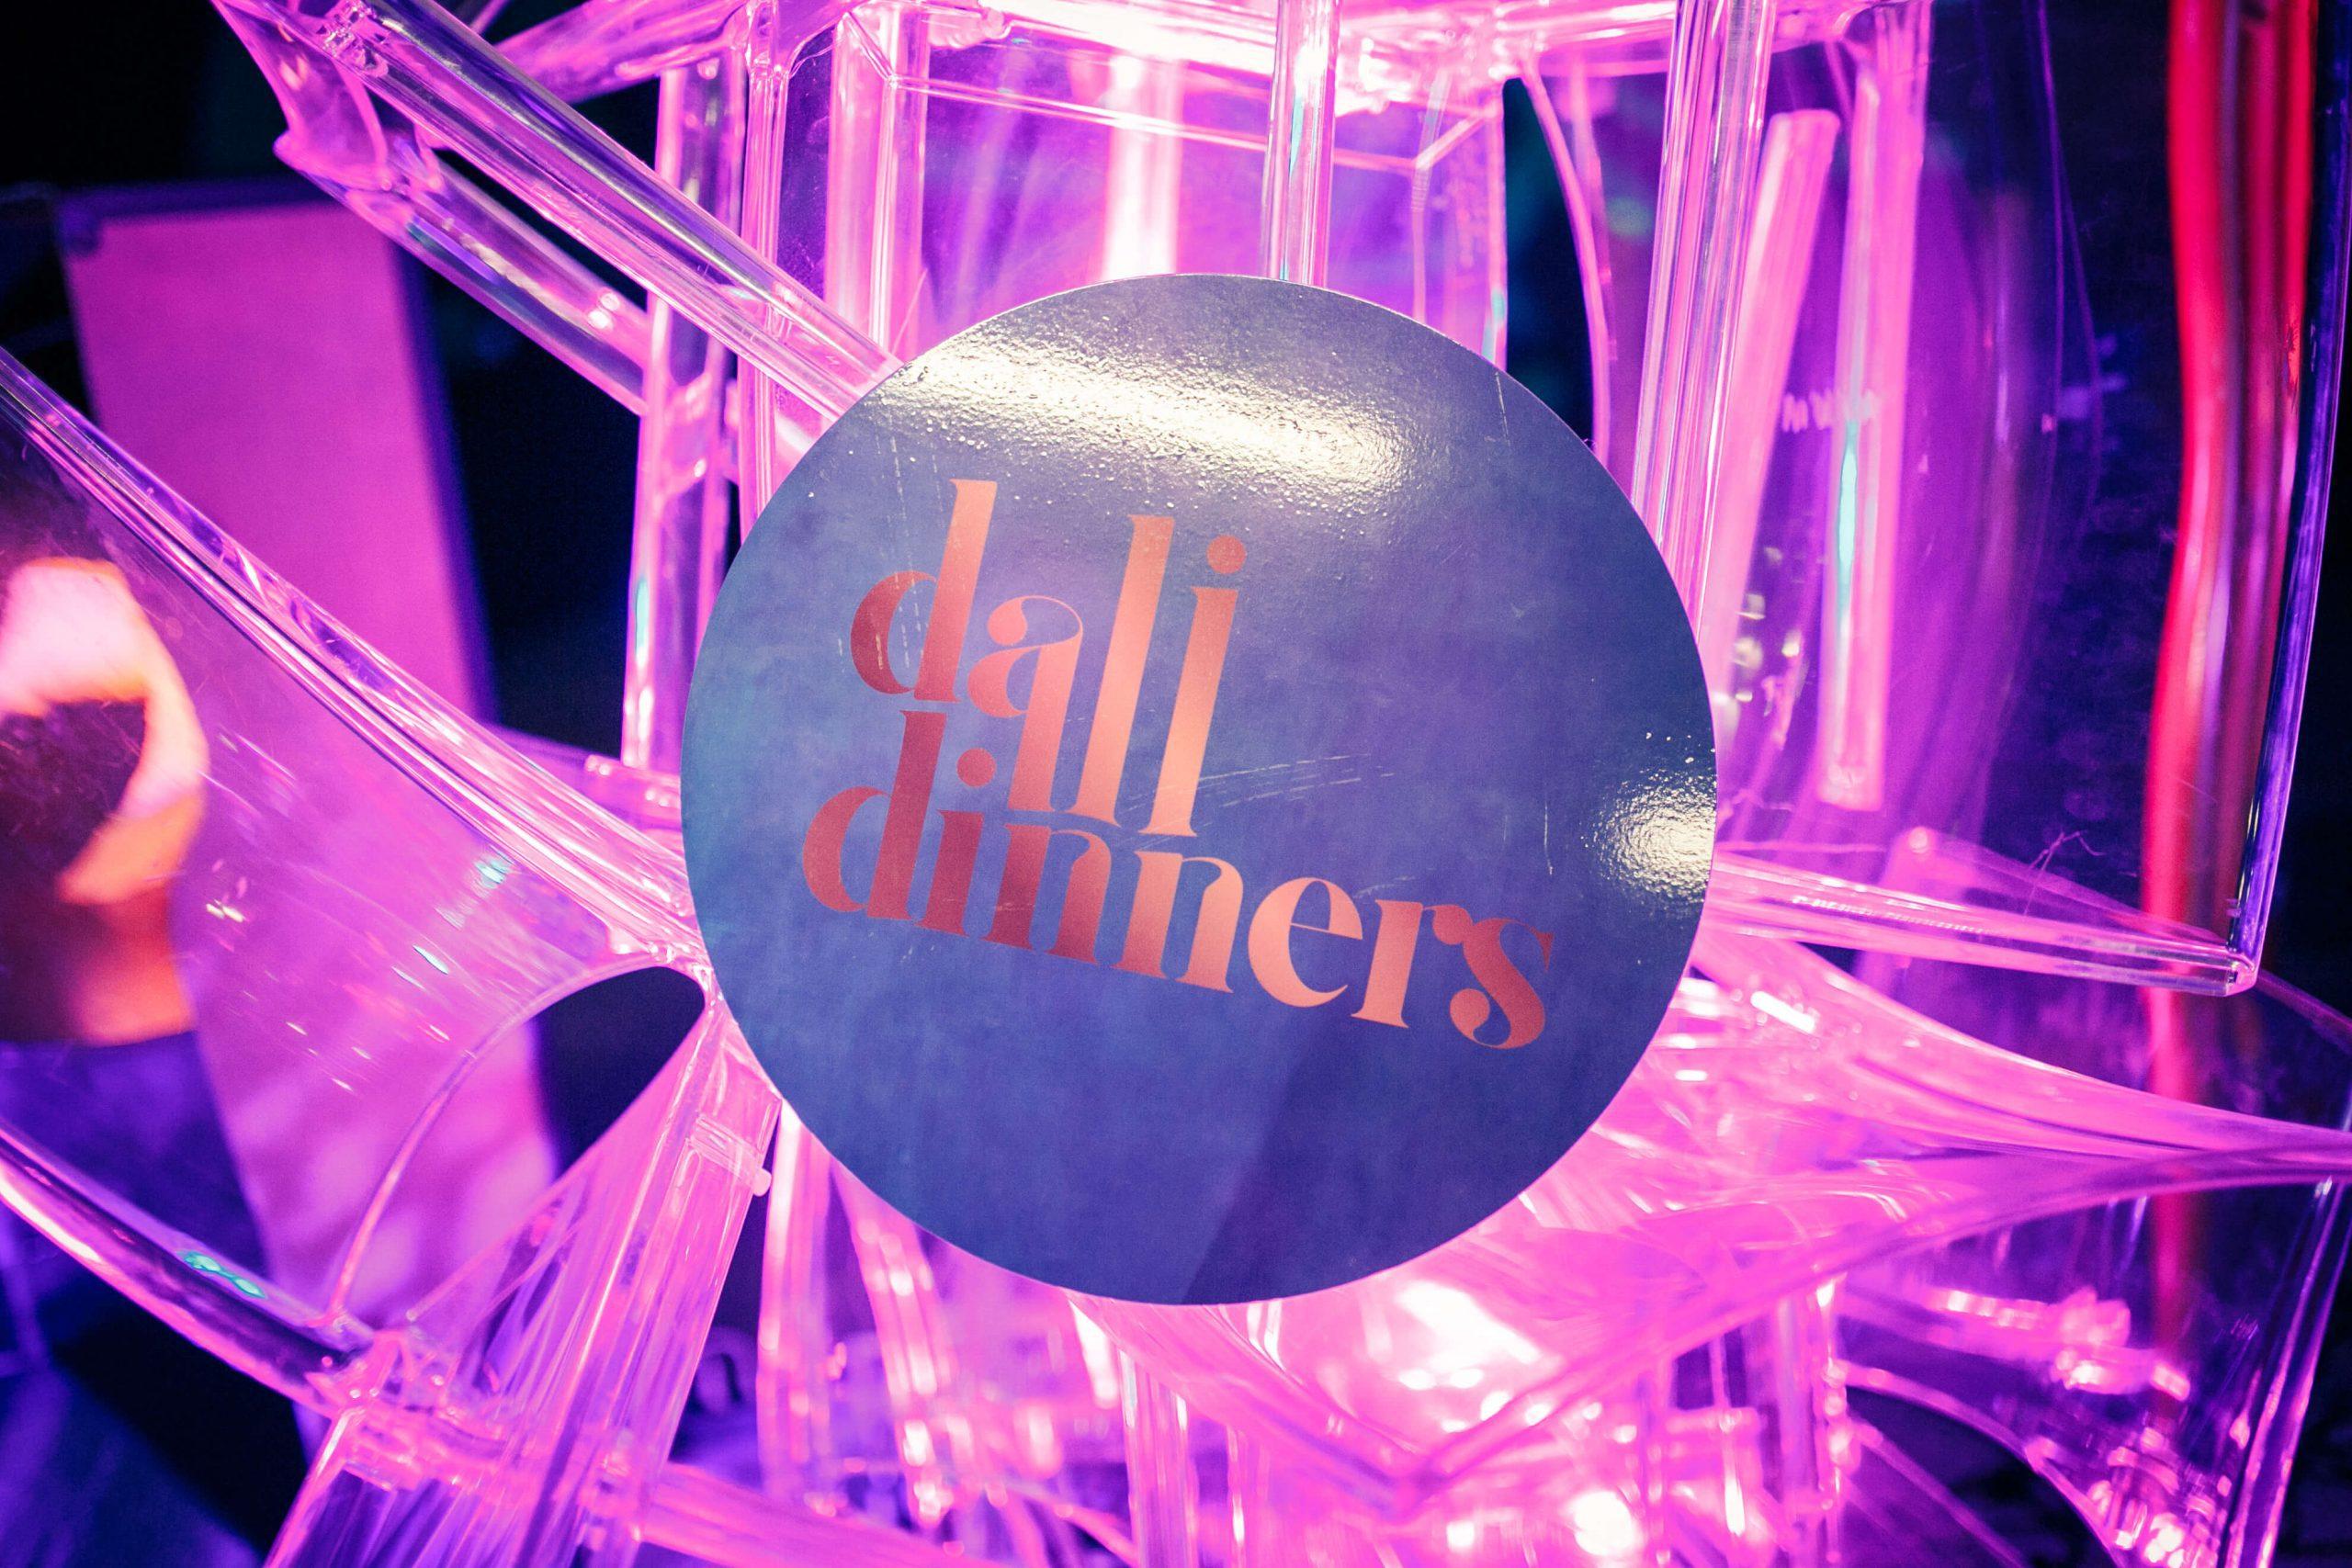 The MAD - Dali Dinners - azanhastudio-012